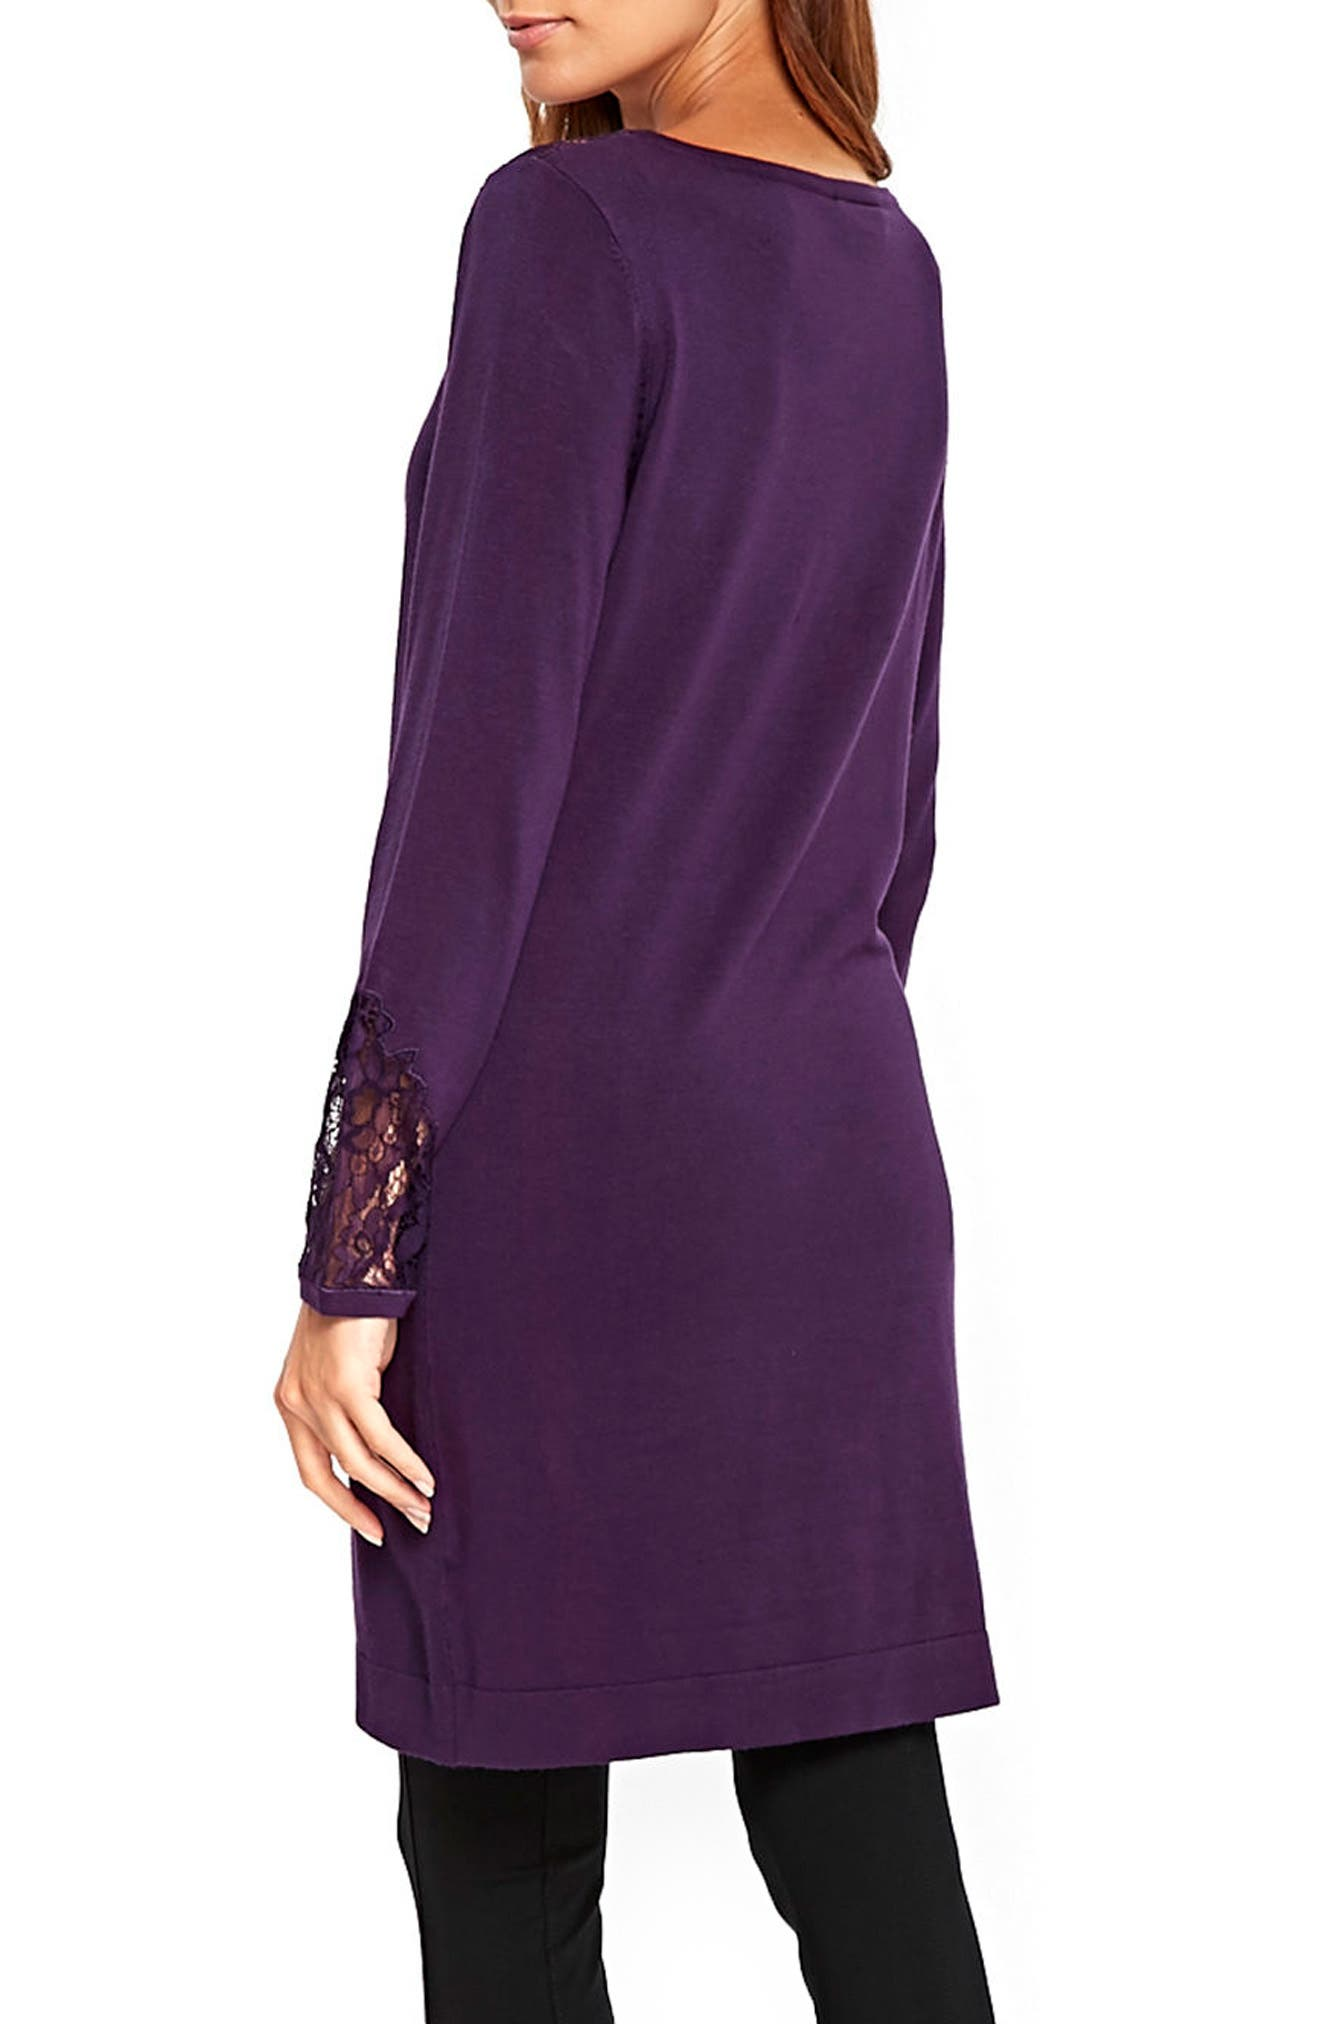 Lace Panel Shift Dress,                             Alternate thumbnail 4, color,